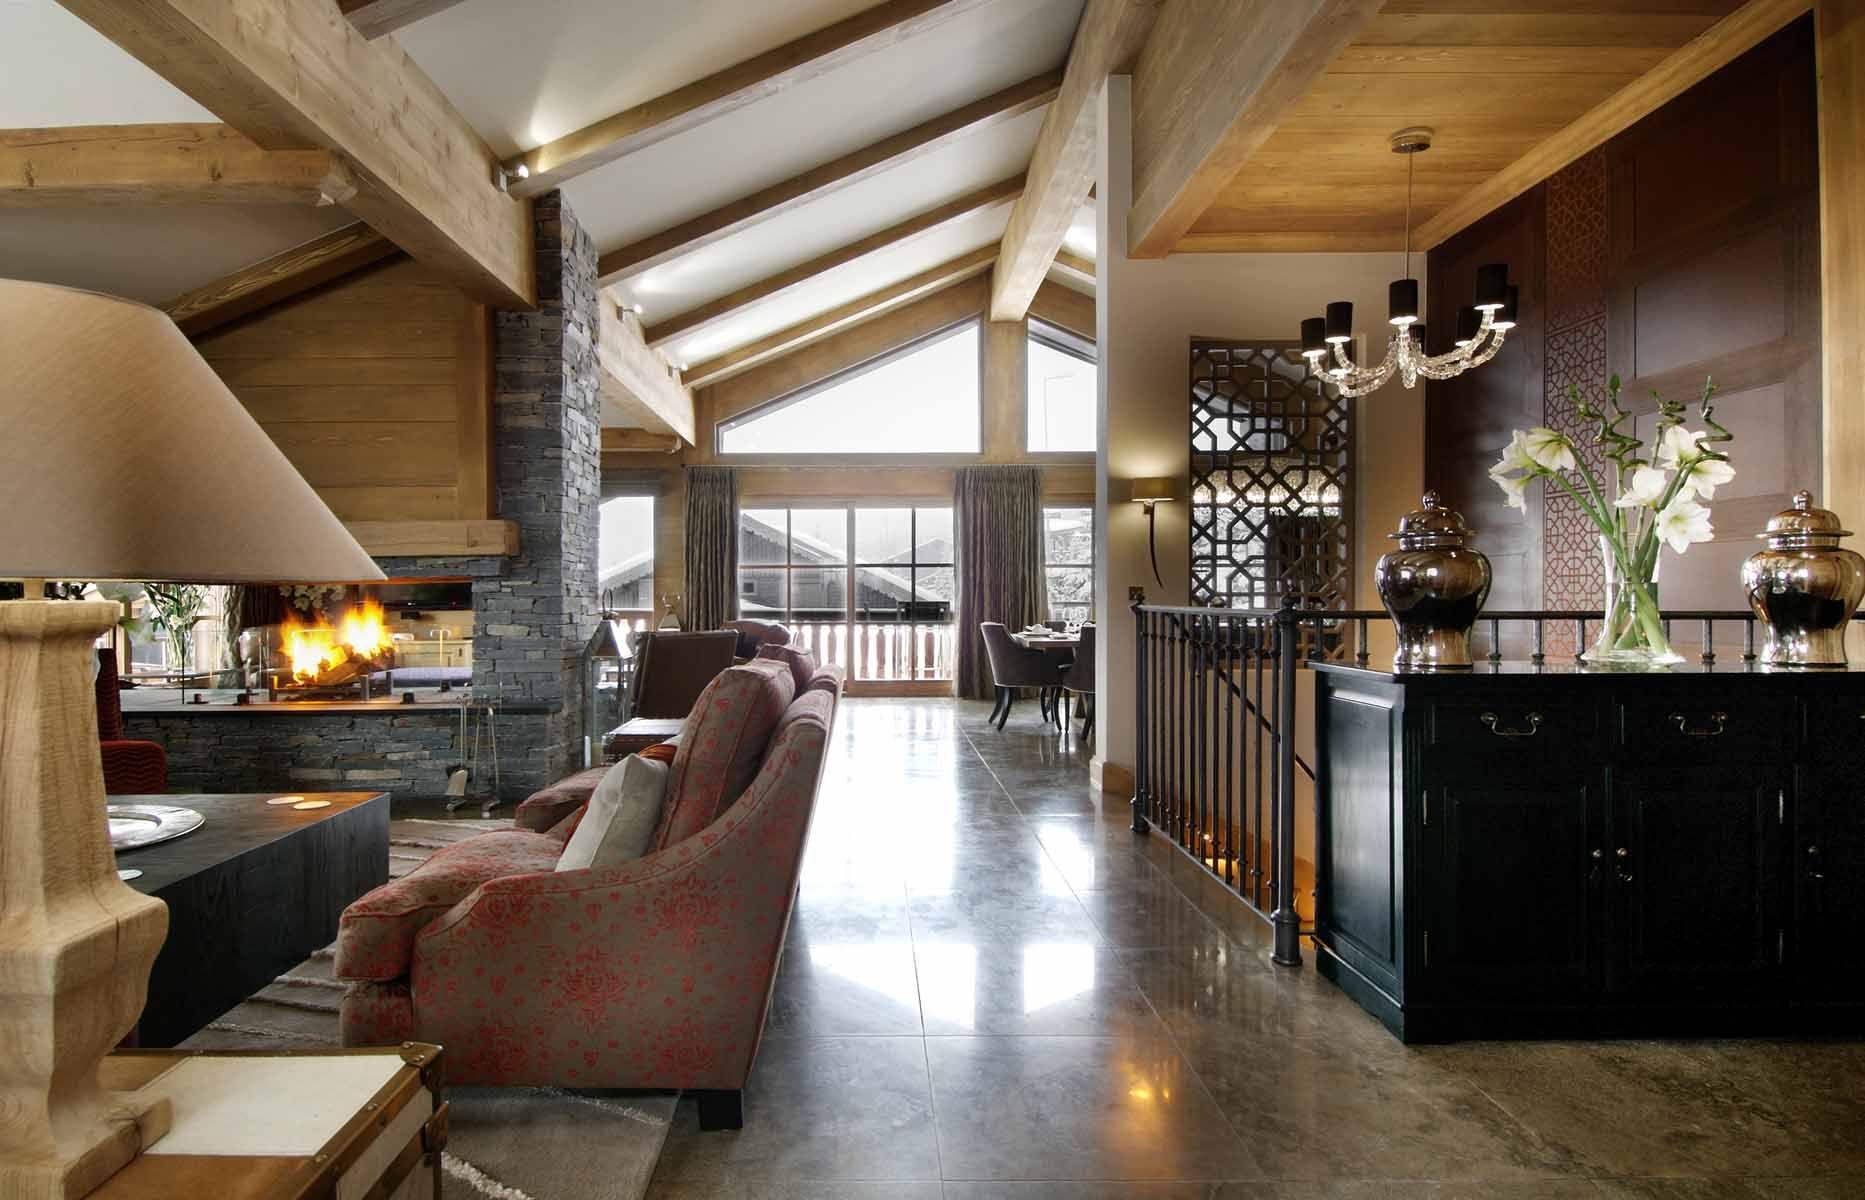 Chalet Le Blanchot | Chalet Interior Design Project | Courchevel 1850, Luxury Chalet interiors, luxury ski chalet design, ski chalet designer, Residential interiors